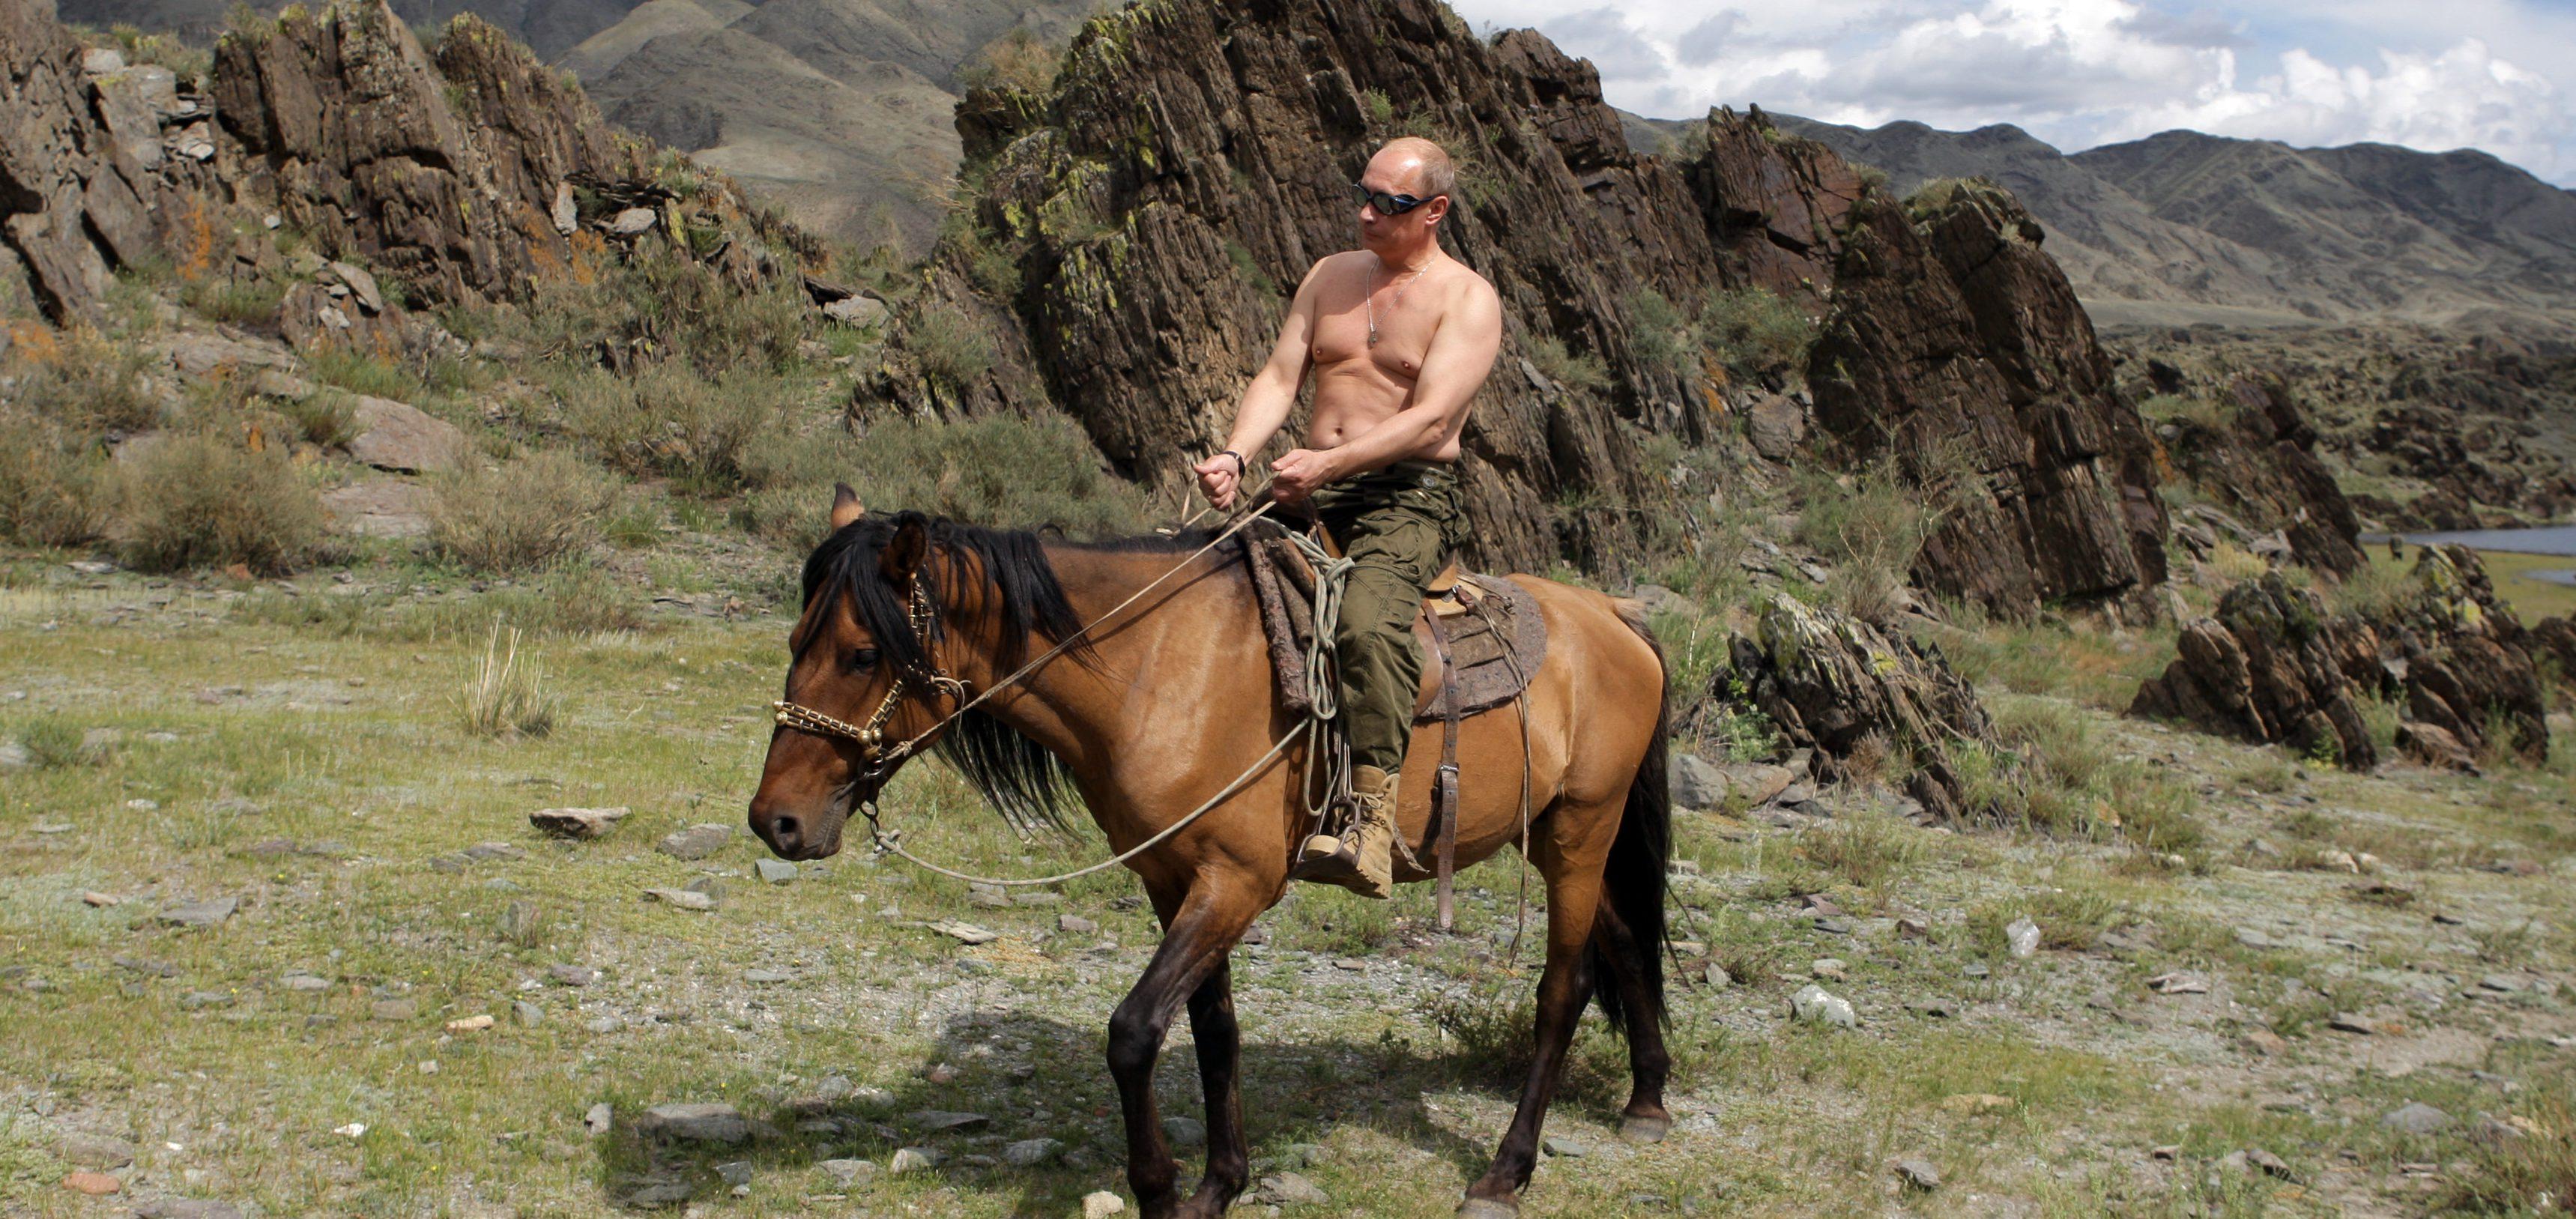 Russia's Prime Minister Putin rides a horse in southern Siberia's Tuva region